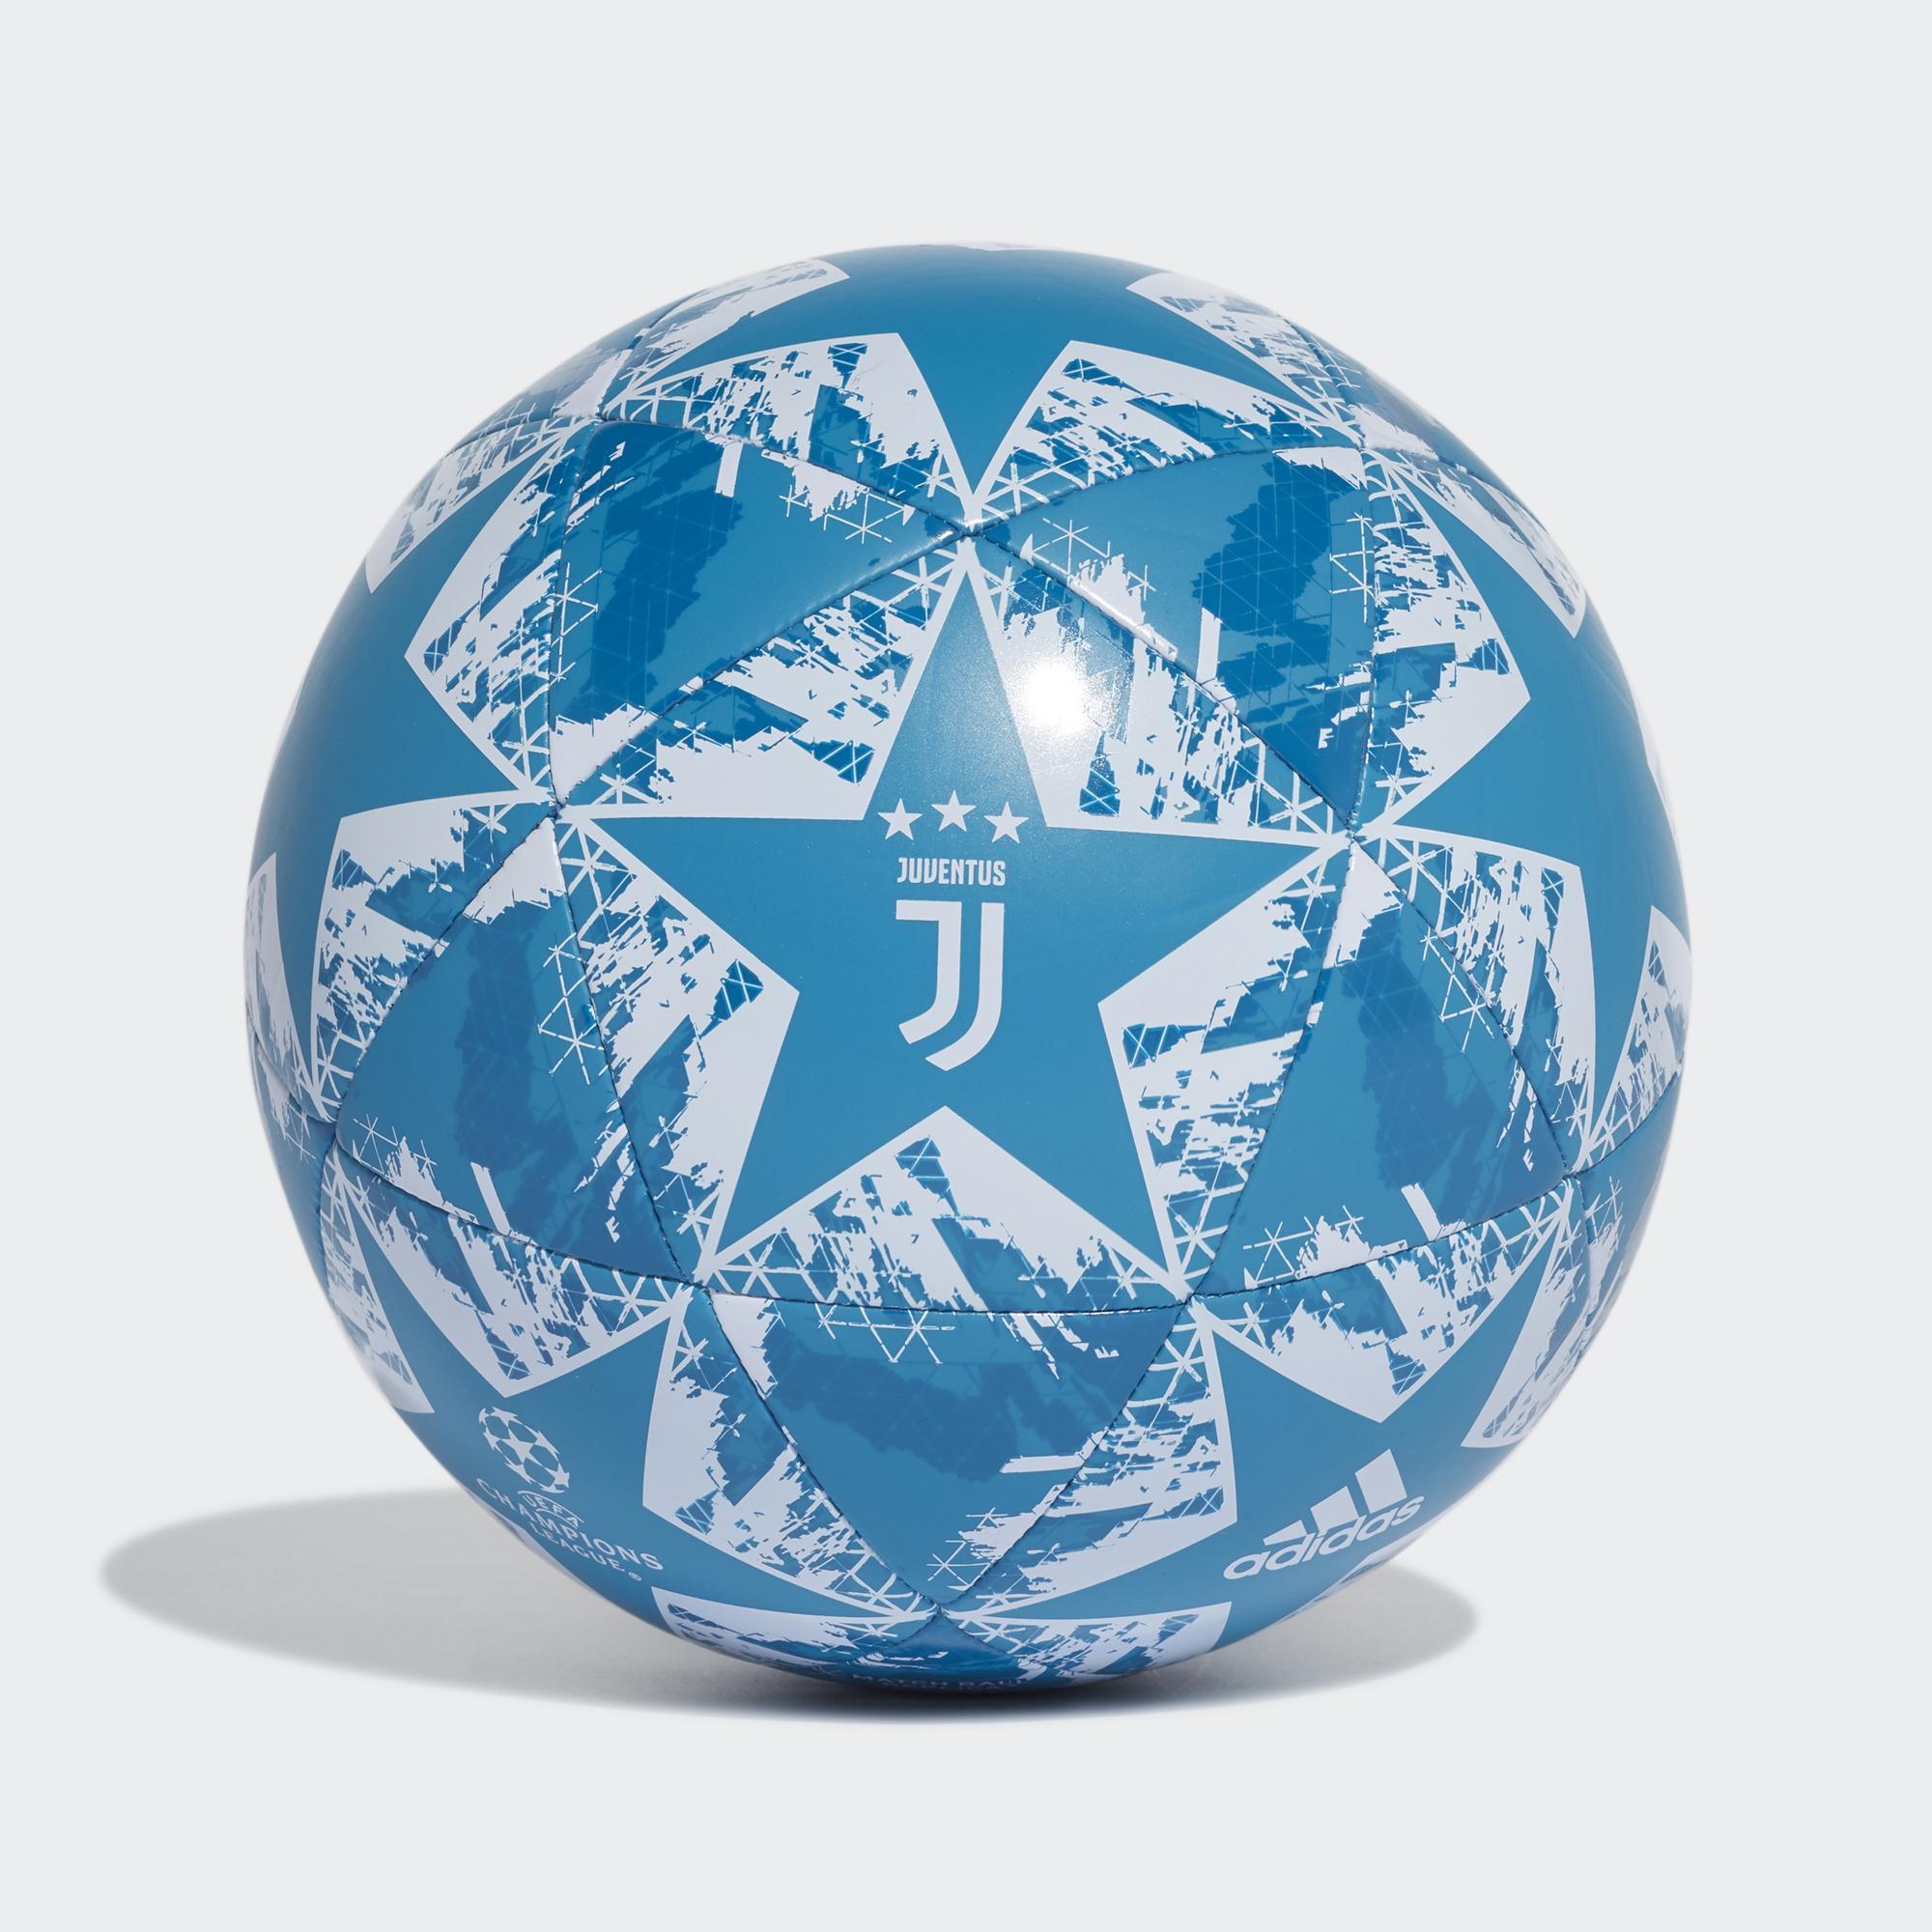 Adidas Pallone Ucl Finale 19 Capitano Juventus